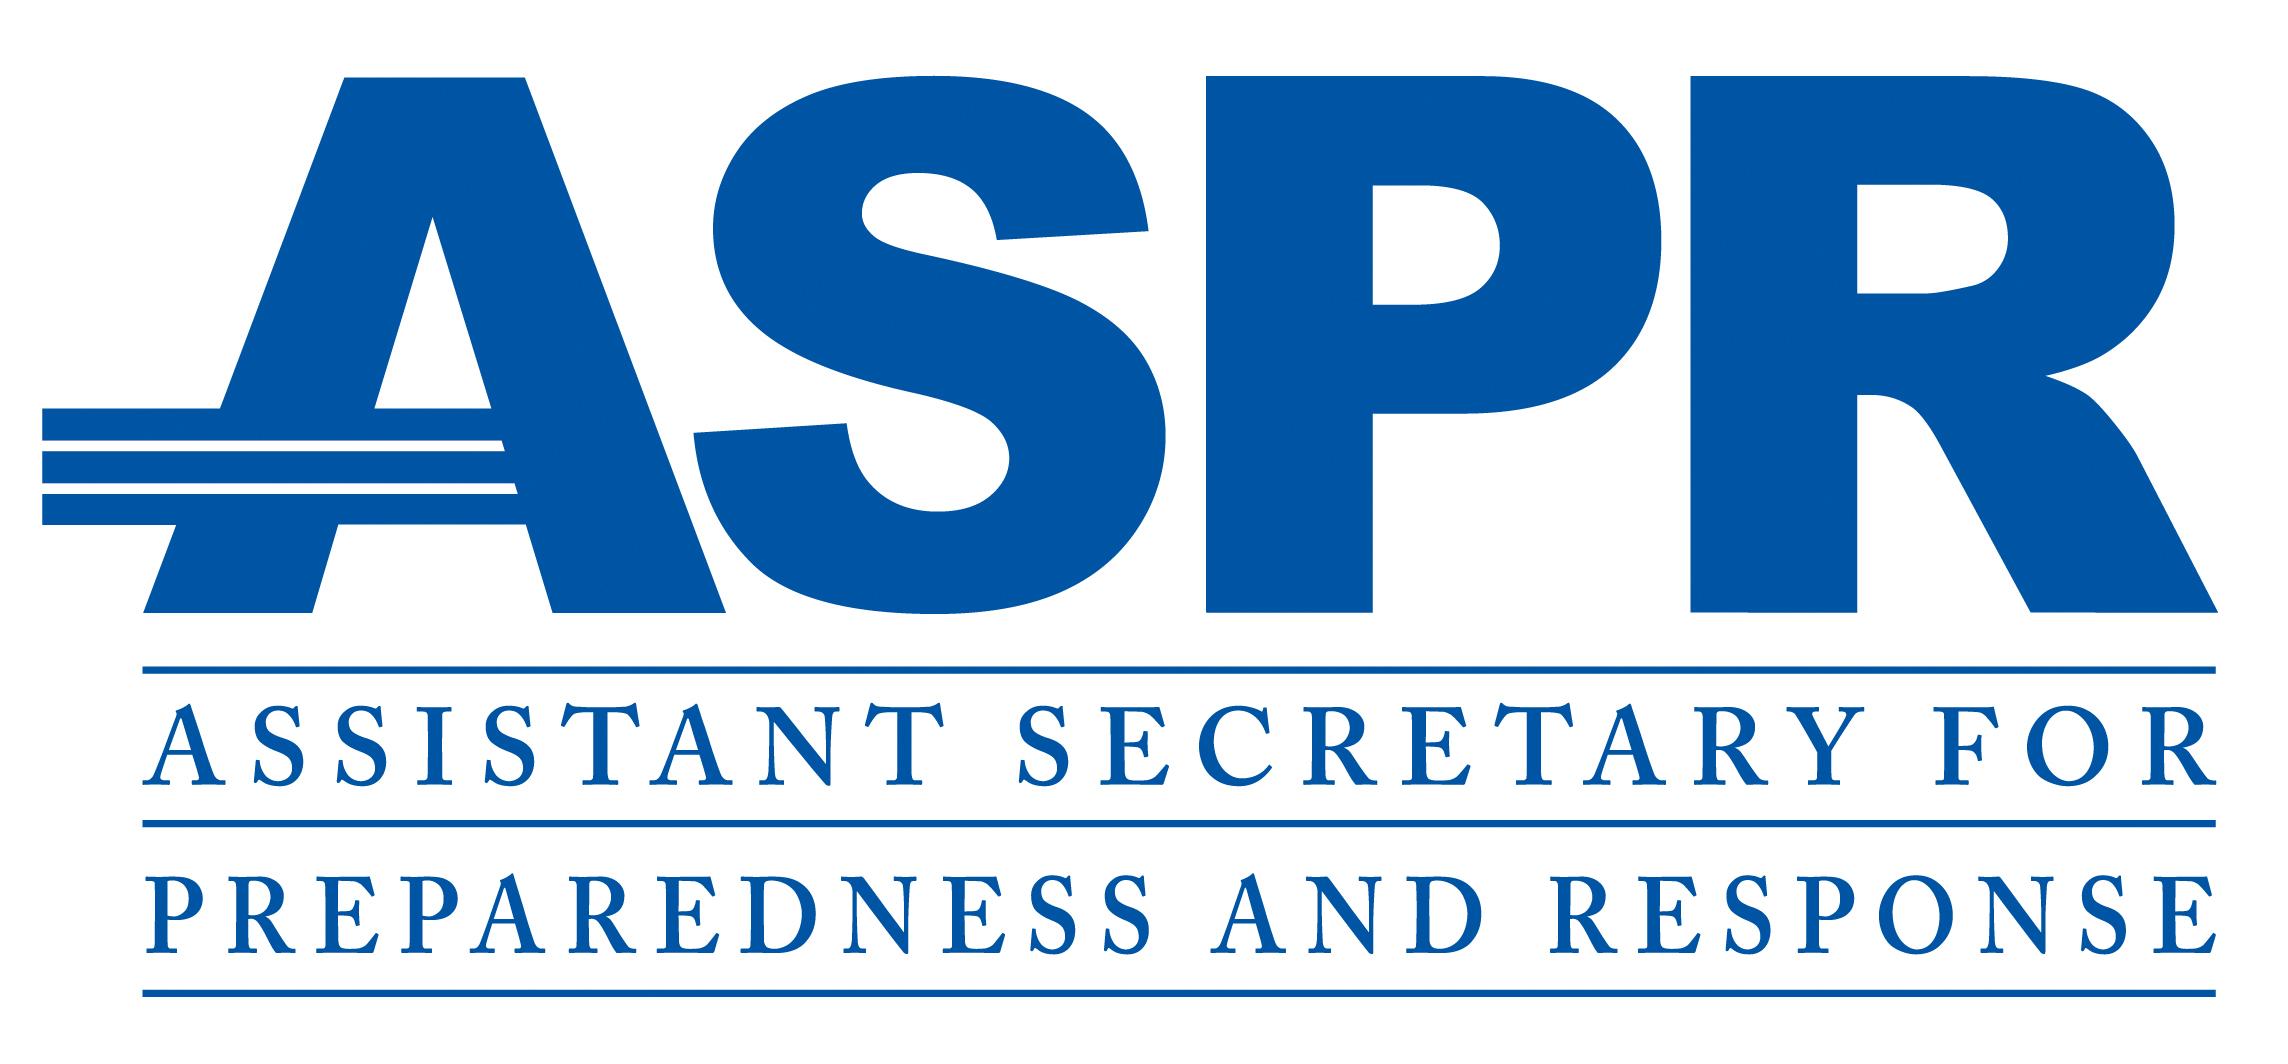 File:ASPR Logo large.jpg - Wikimedia Commons